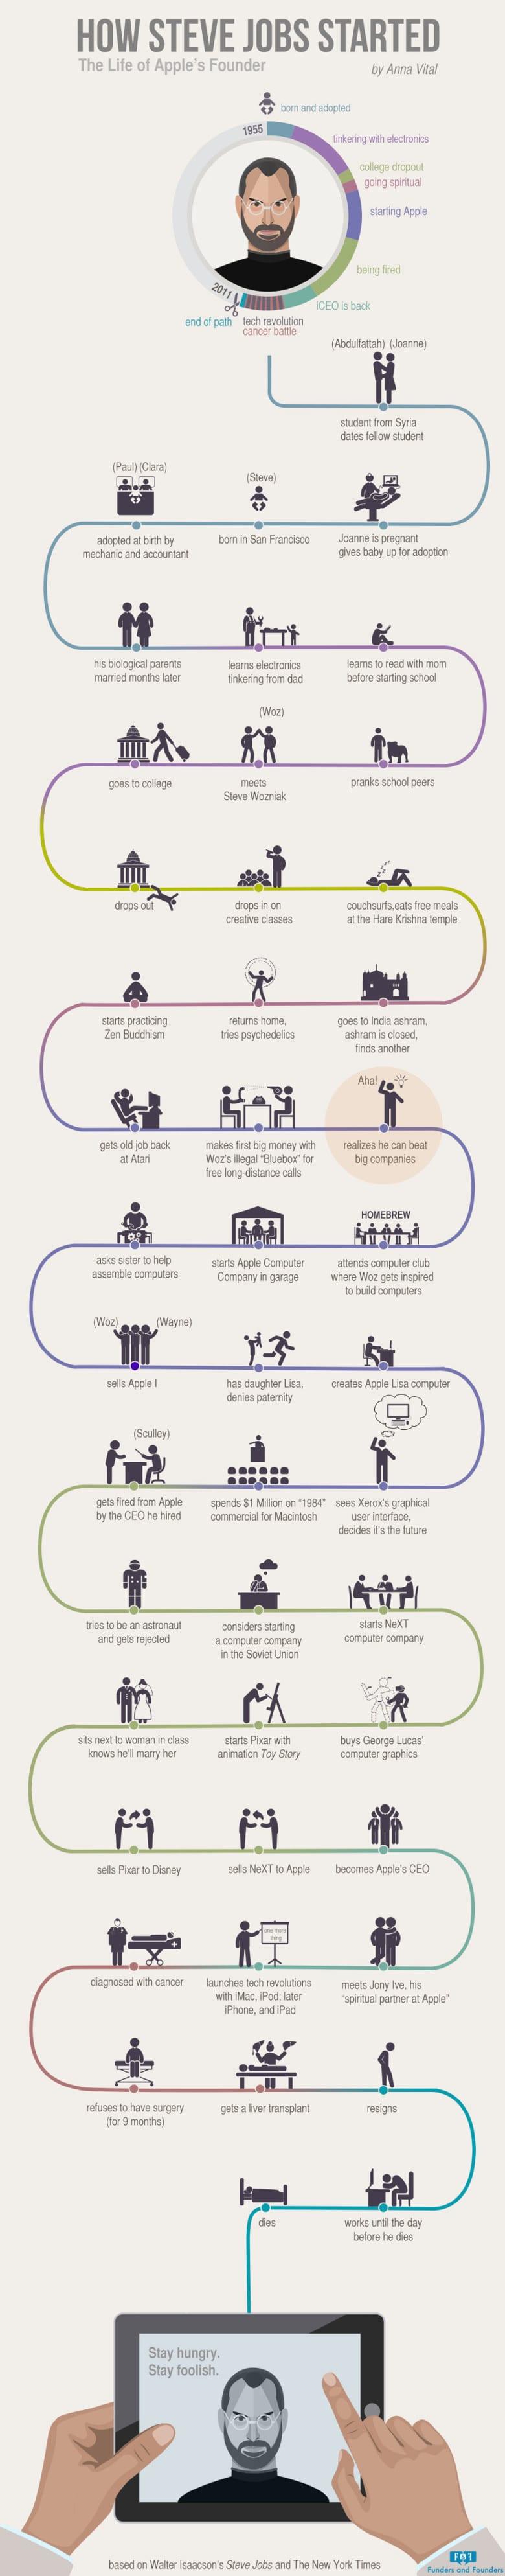 infographic-steve-jobs-life